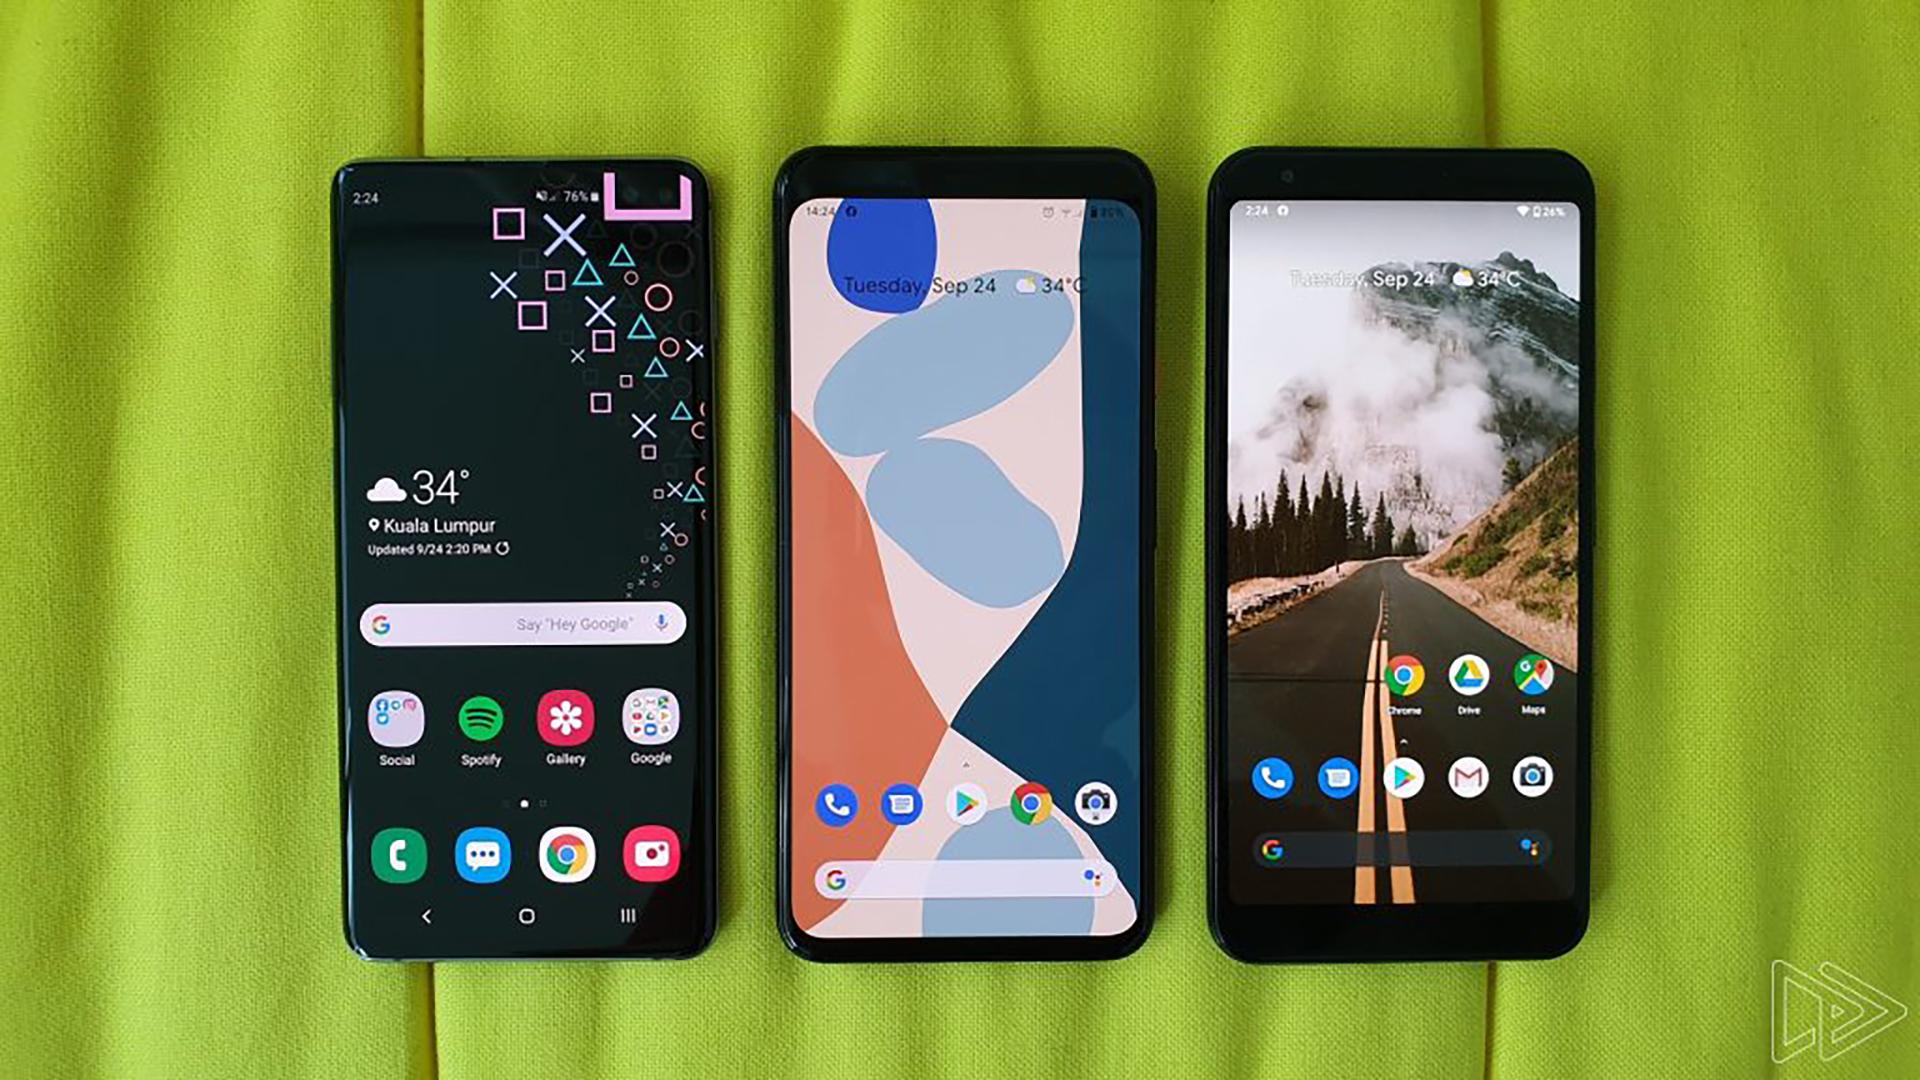 Google Pixel 4 XL between a Samsung Galaxy S10 Plus and a Google Pixel 3a XL